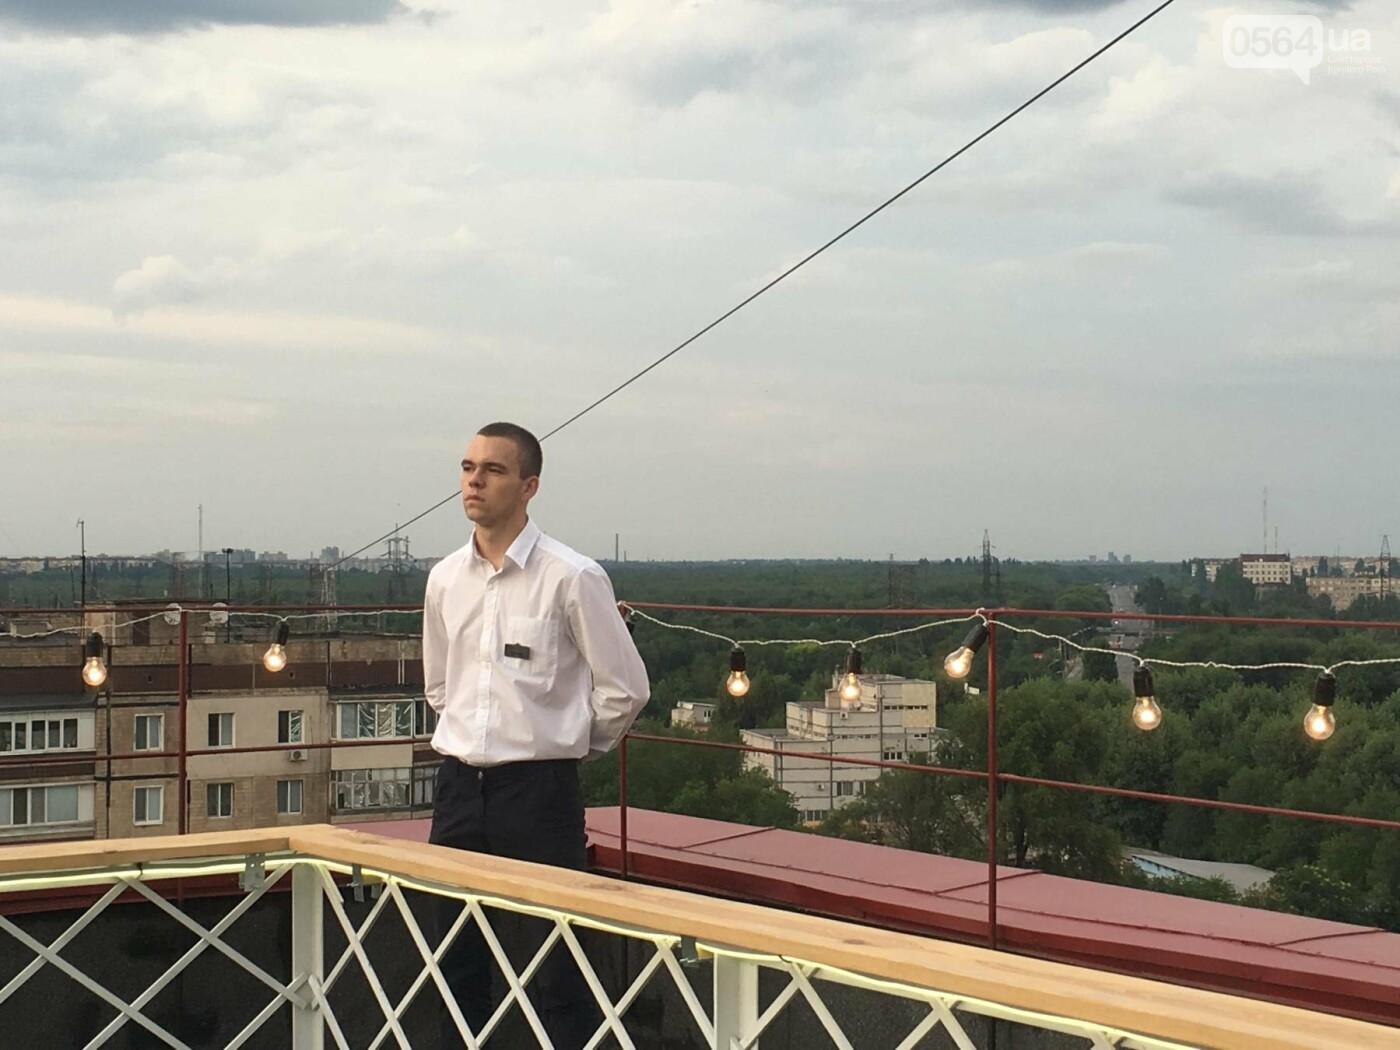 Сотни криворожан встречали закат на крыше отеля под мелодии джаза, - ФОТО, ВИДЕО, фото-16